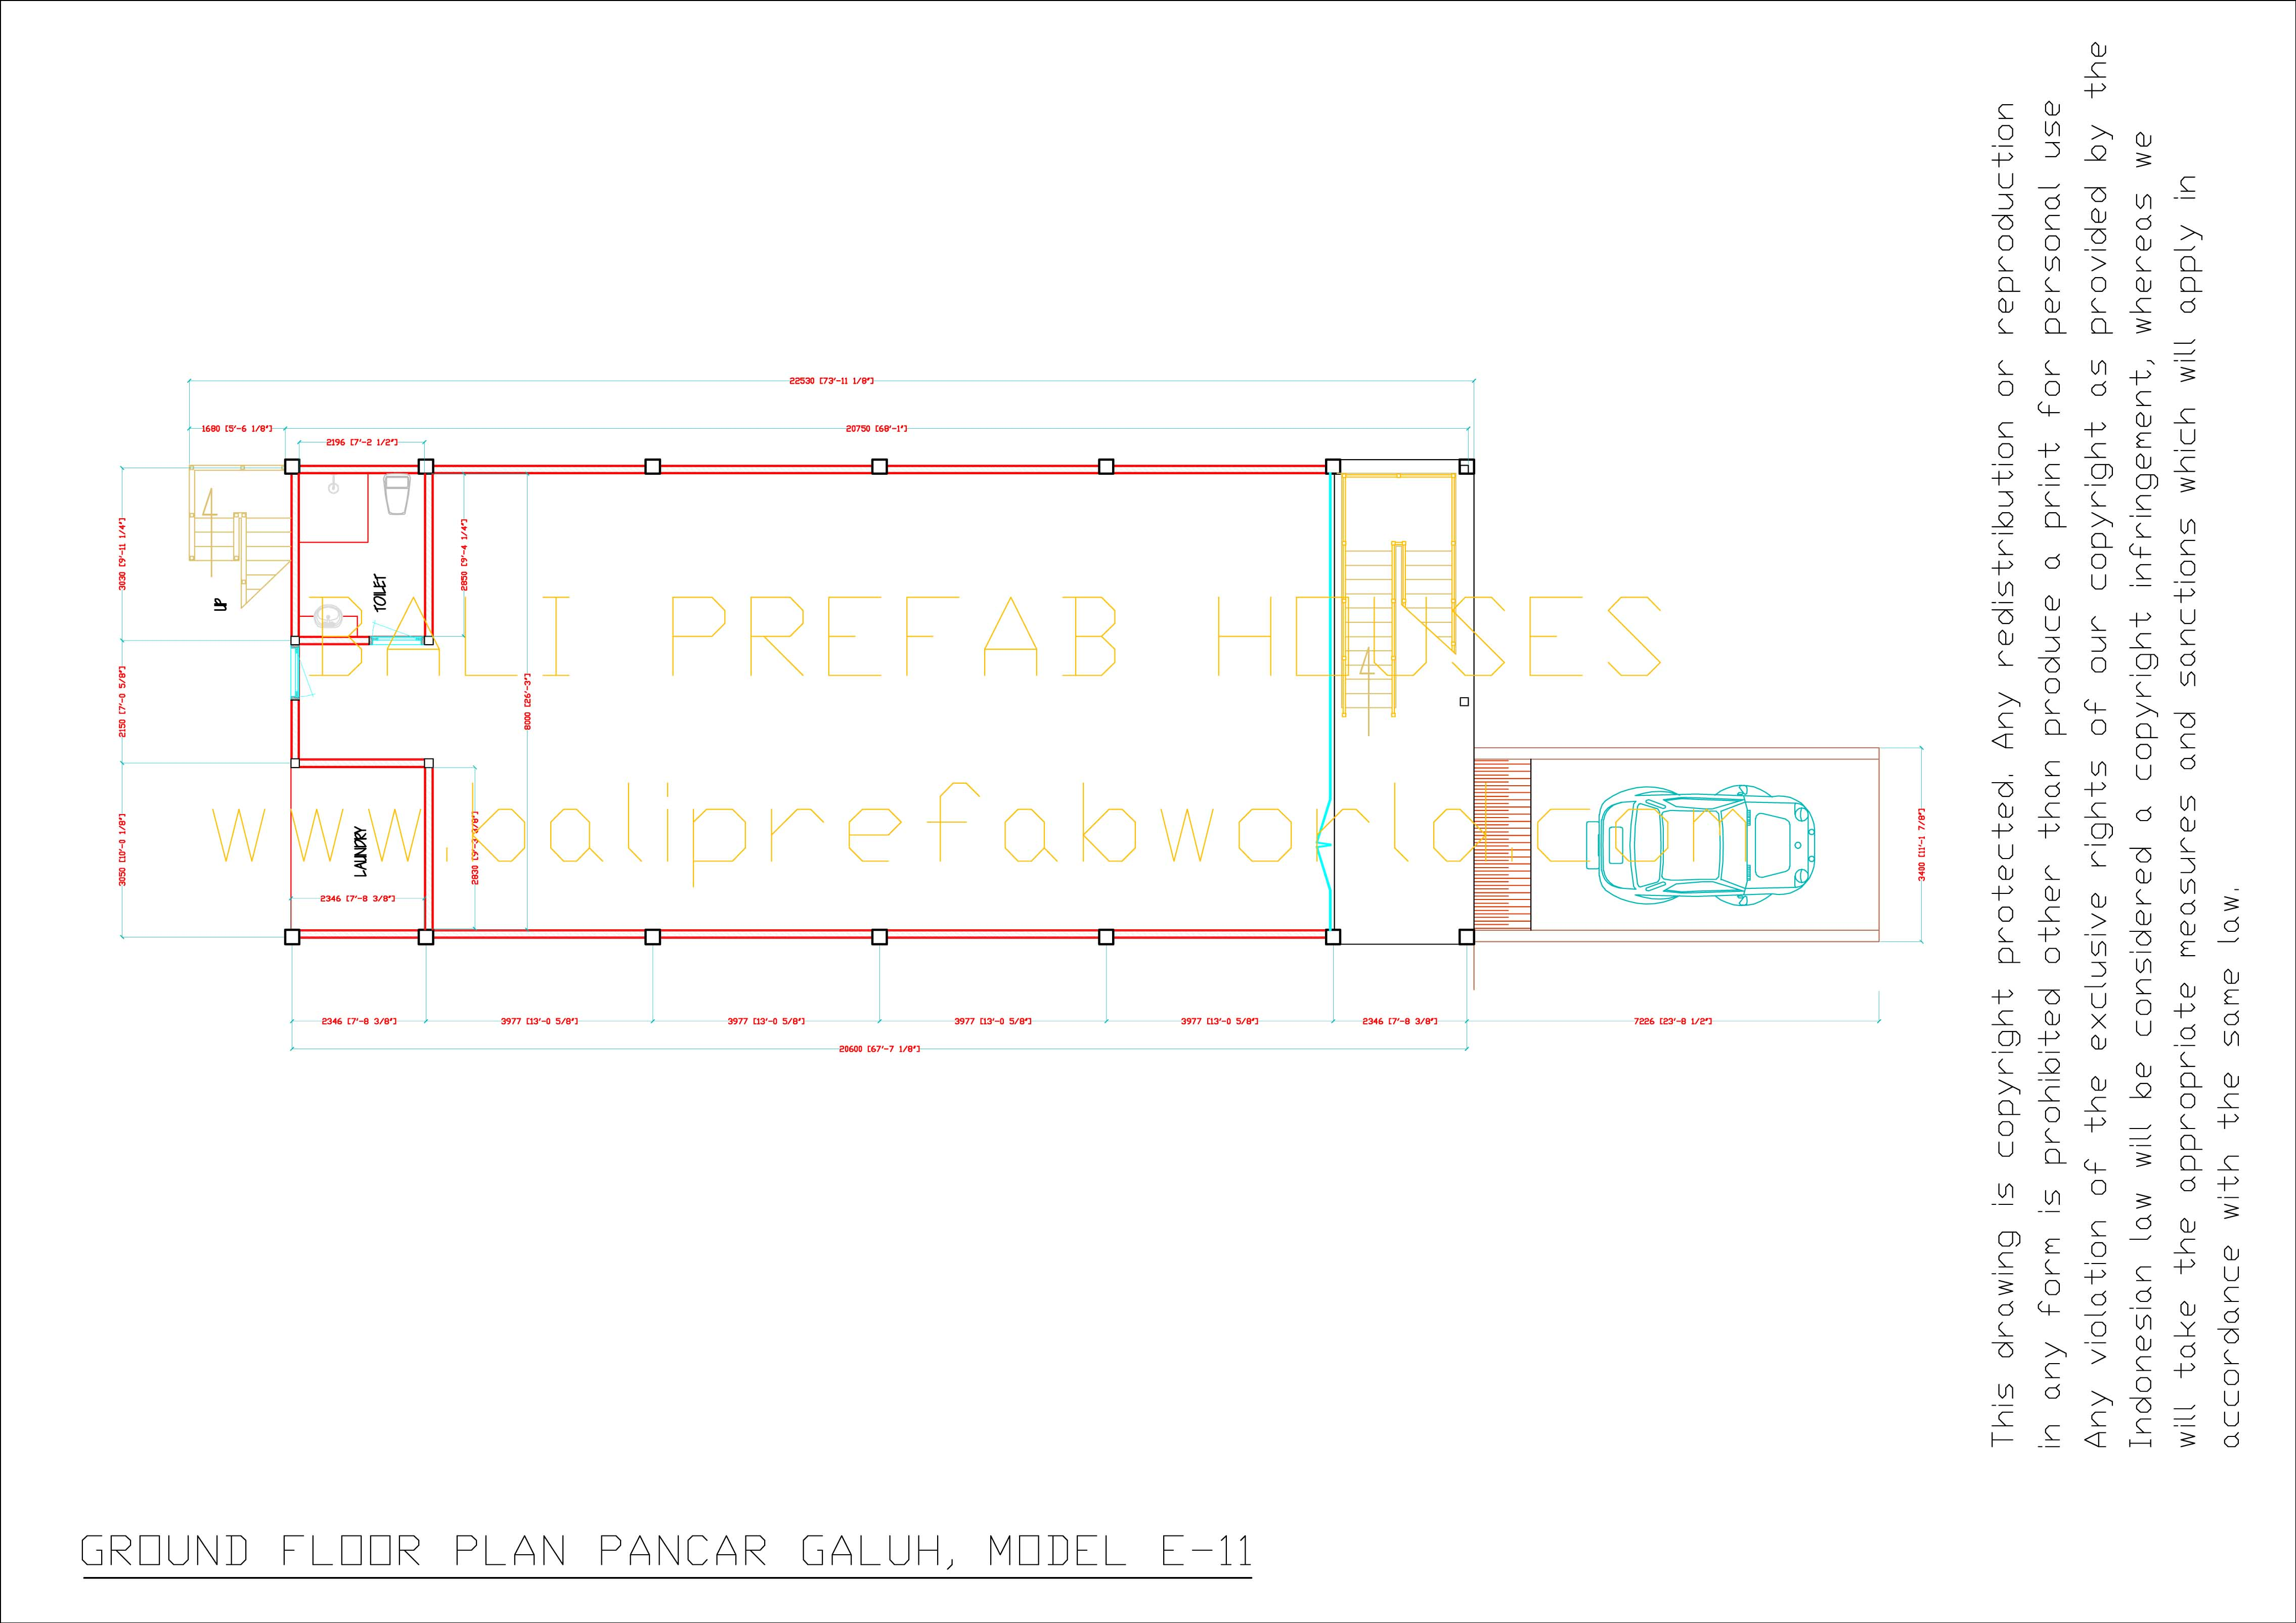 Single Floor Elevation Drawing : Pancar galuh